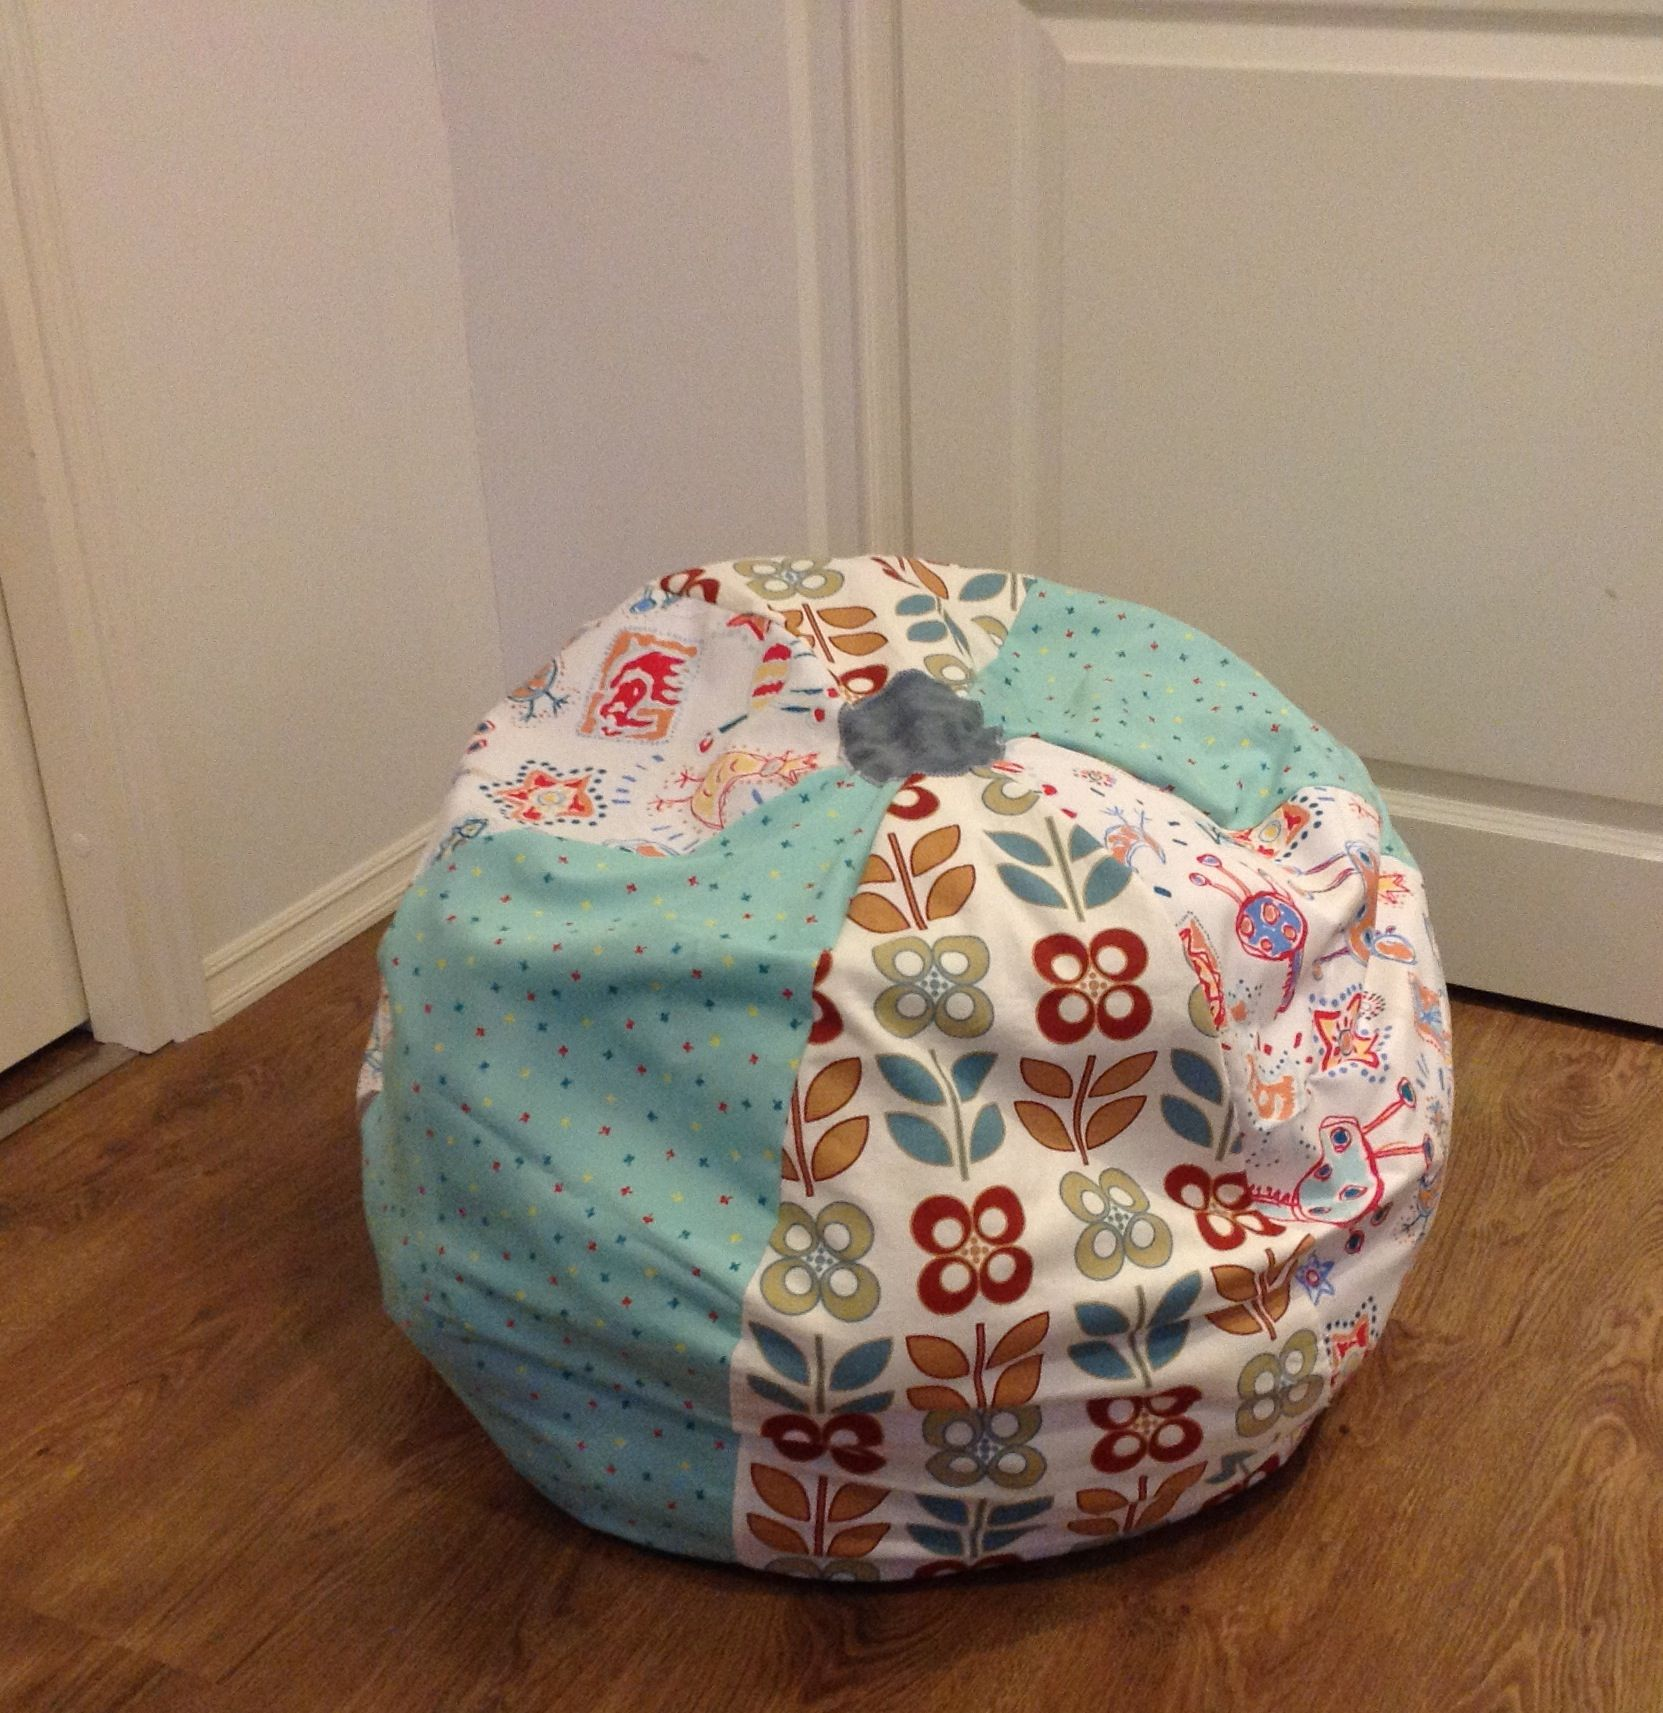 Zebra Print Bean Bag Chair Design For Elderly Diy Stuffed Animal Storage With A Zipper E G